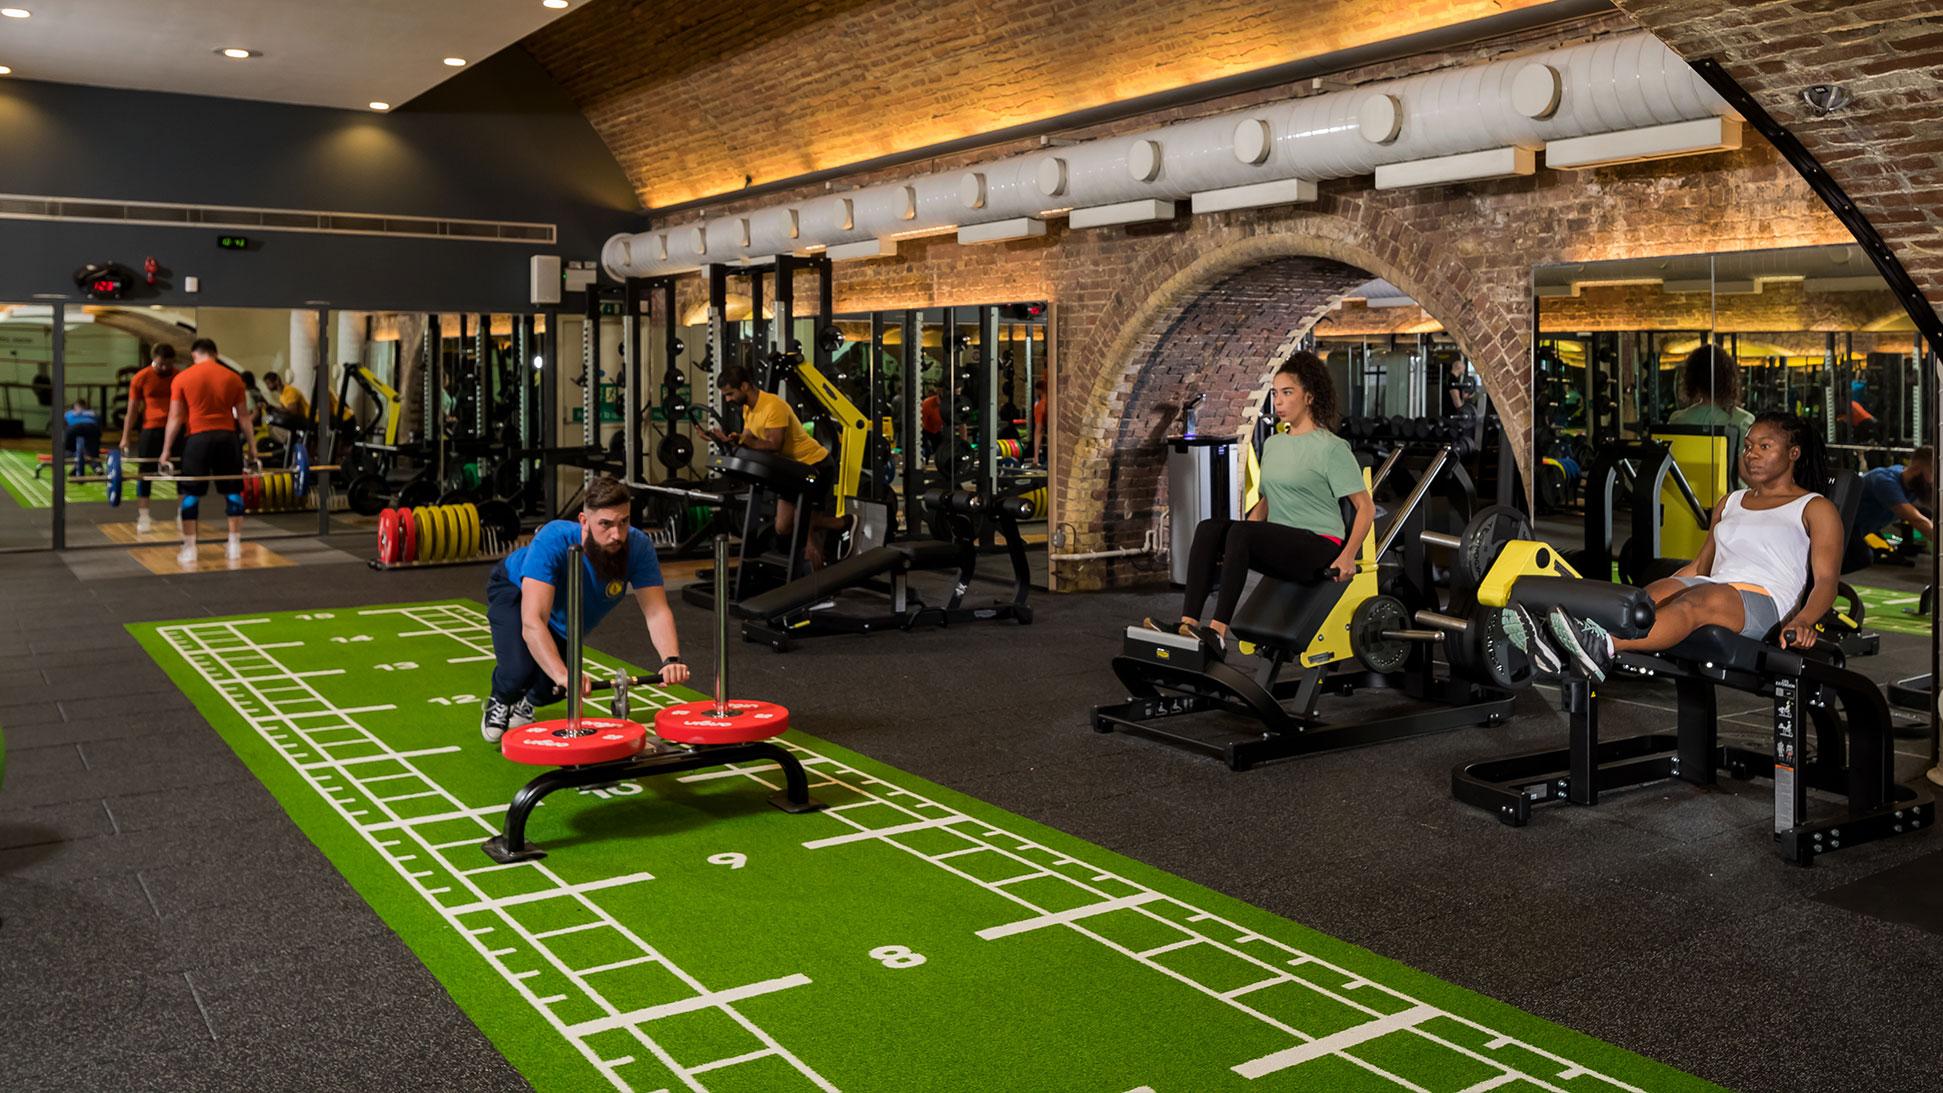 City gym spin studio